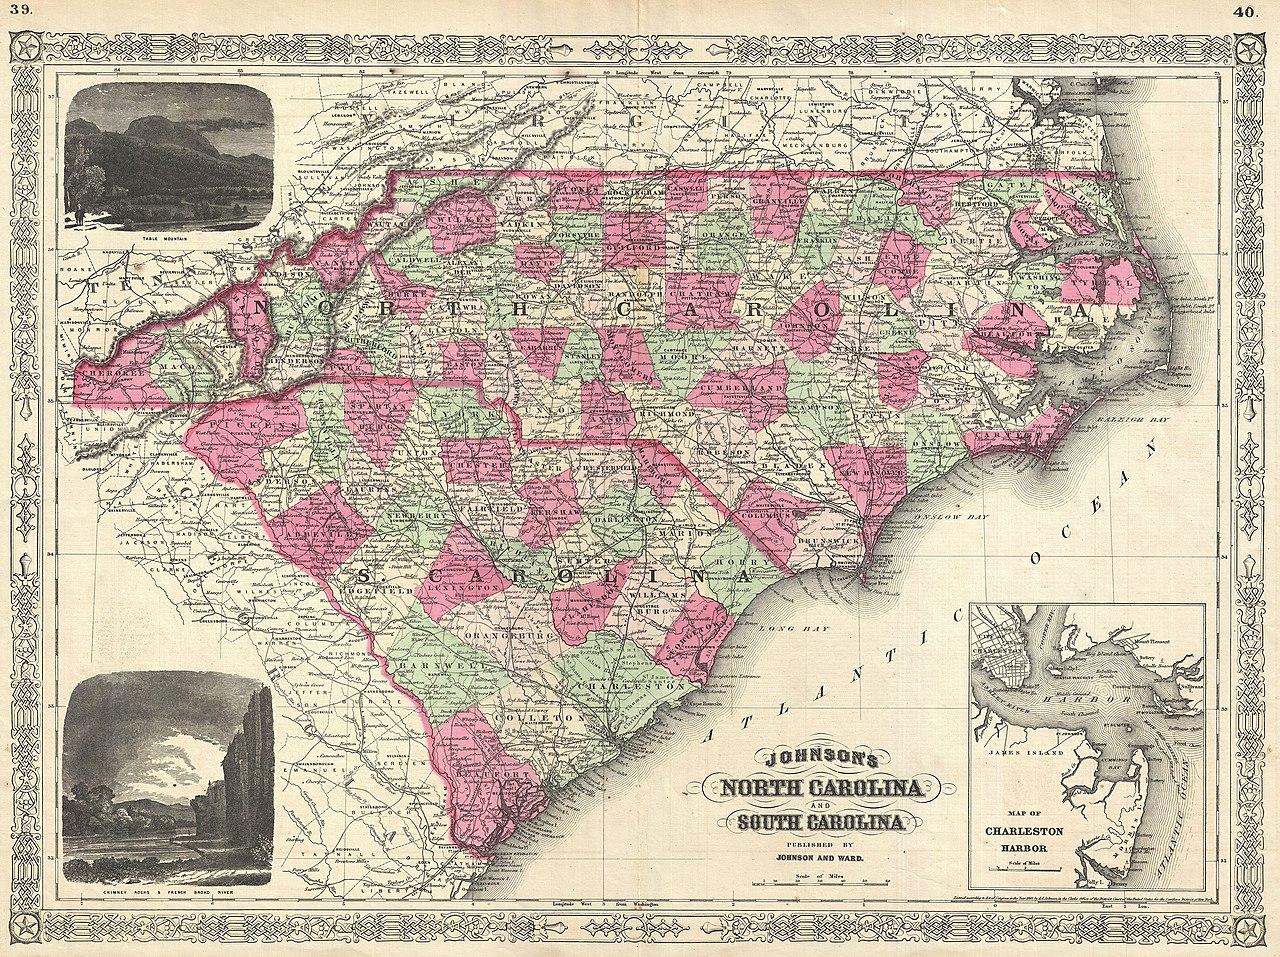 File:1866 Johnson Map of North Carolina and South Carolina ...